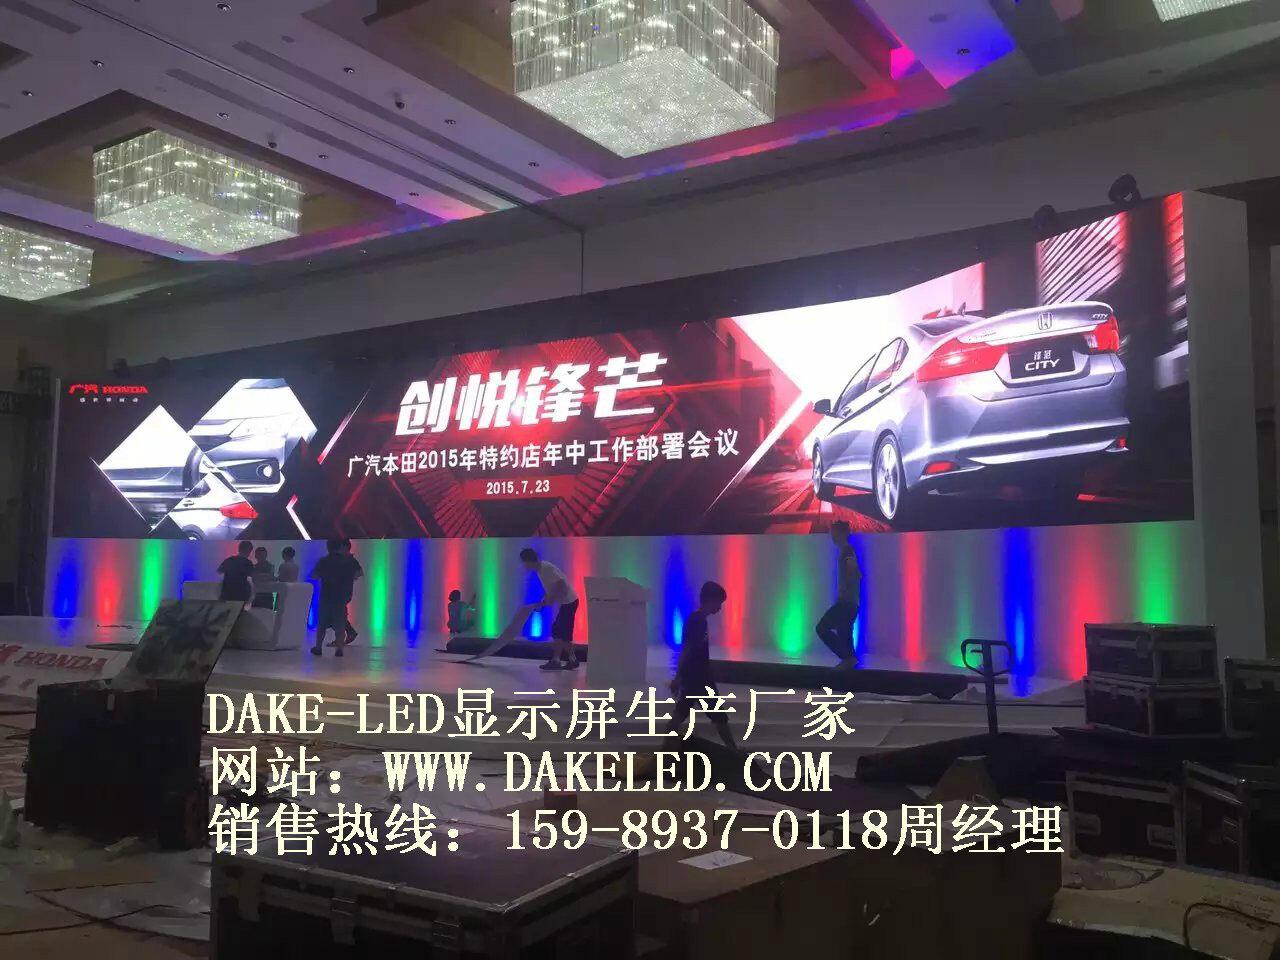 led显示屏  对于使用传统喷绘类广告的传媒客户,完全可利用现有钢结构